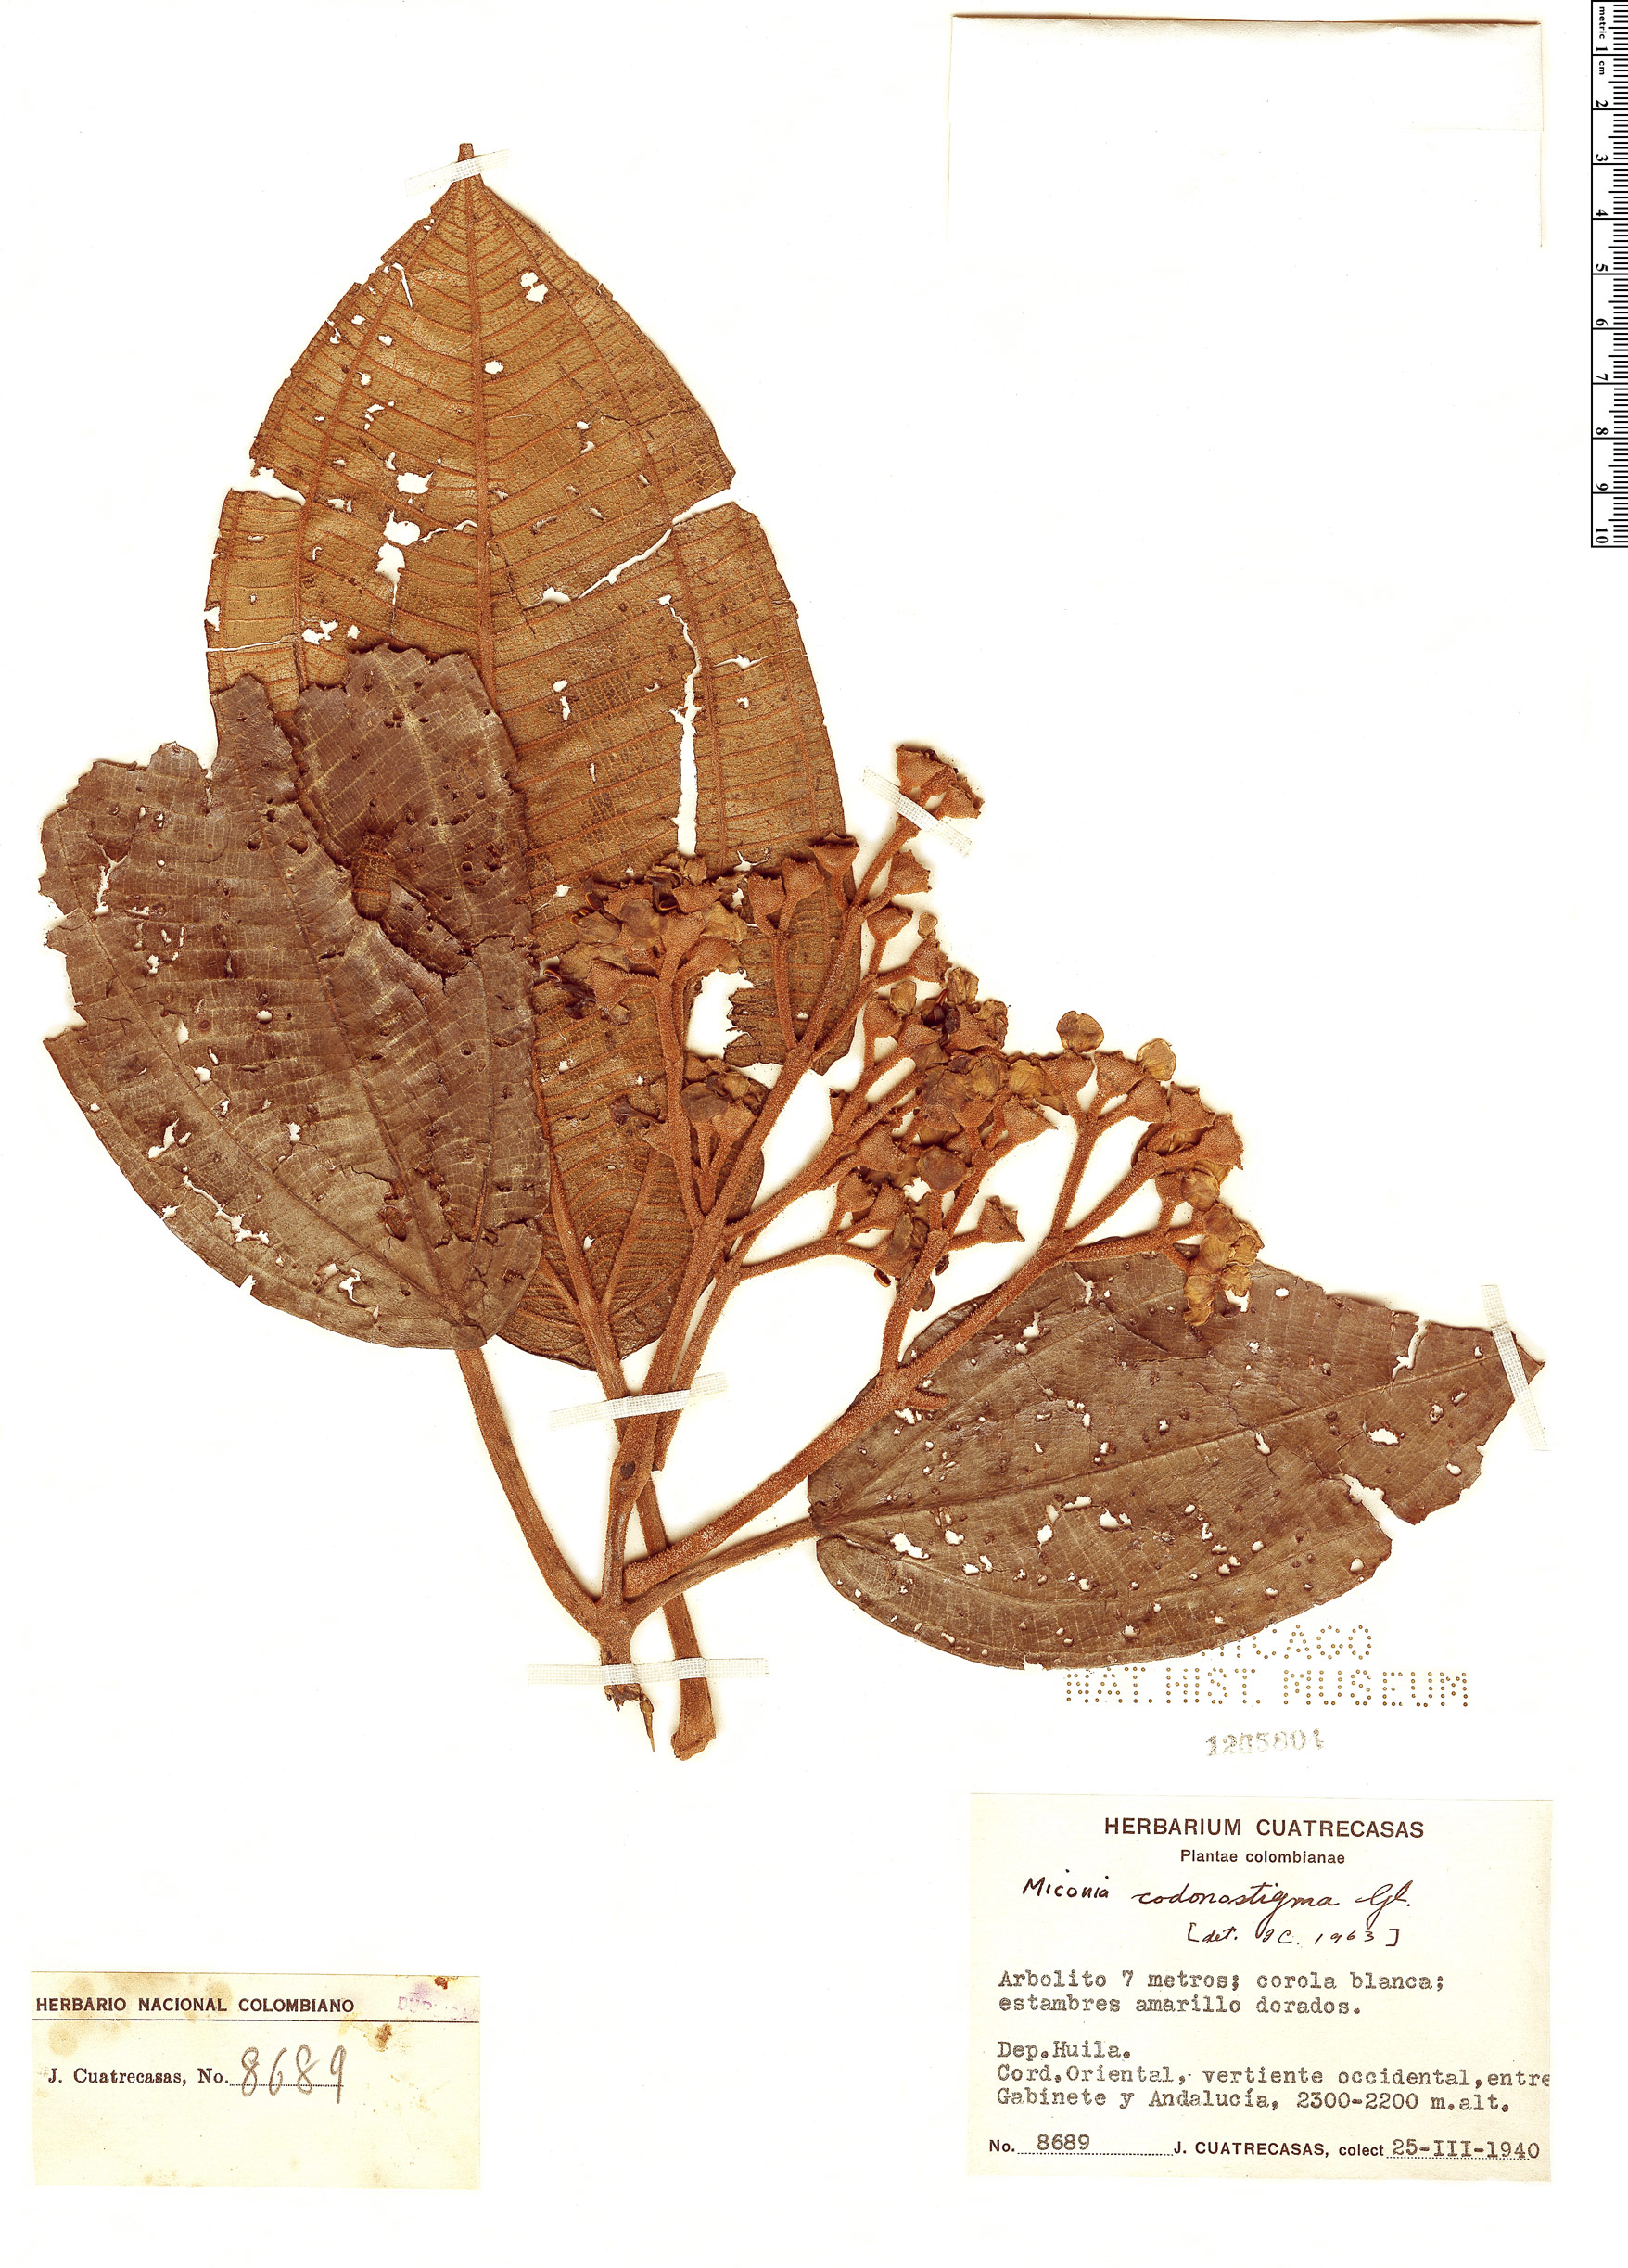 Specimen: Miconia codonostigma